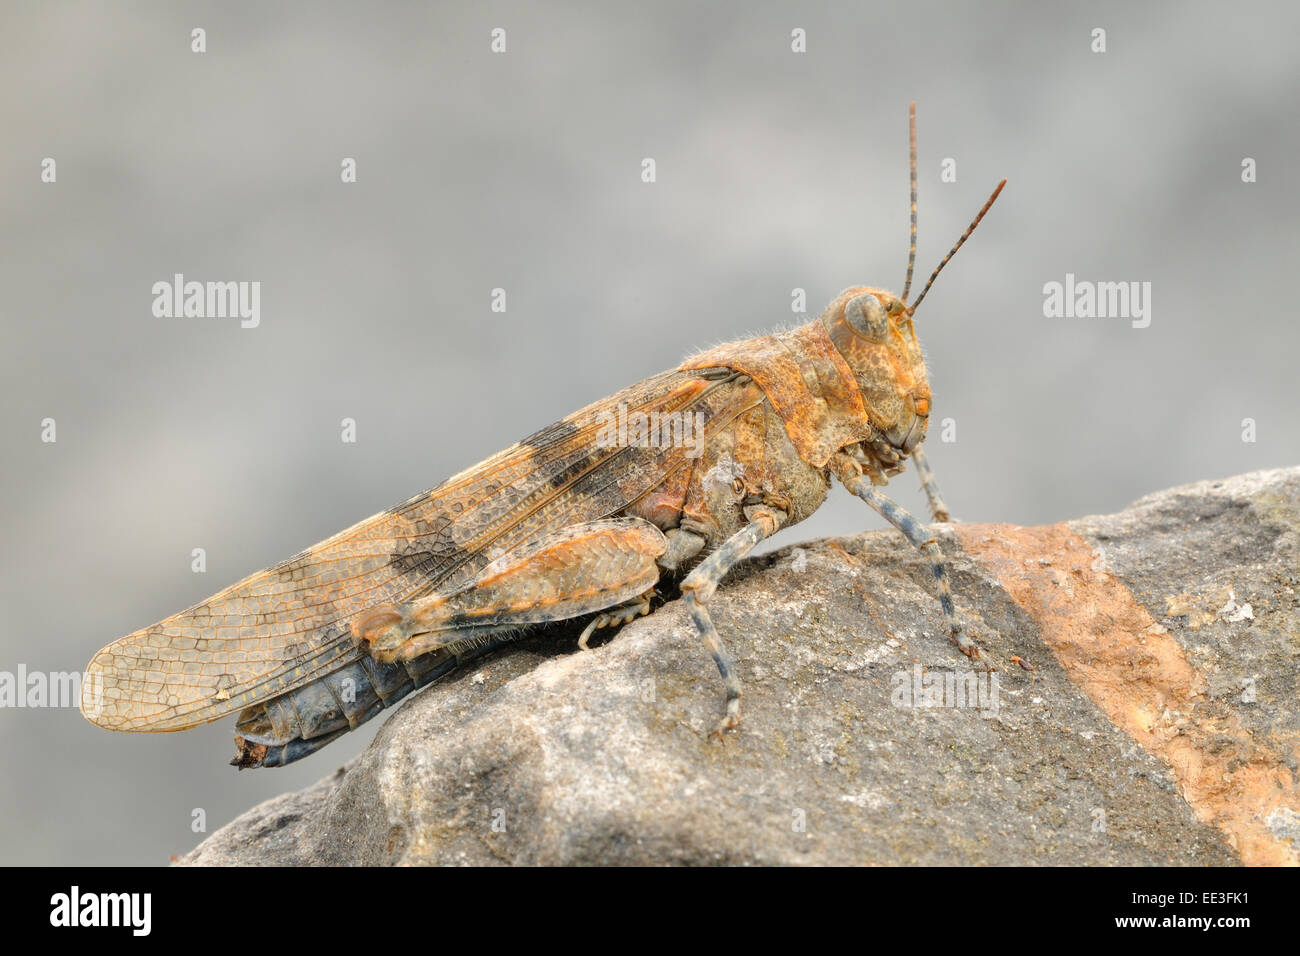 blue-winged grasshopper [Oedipoda caerulescens], germany Stock Photo